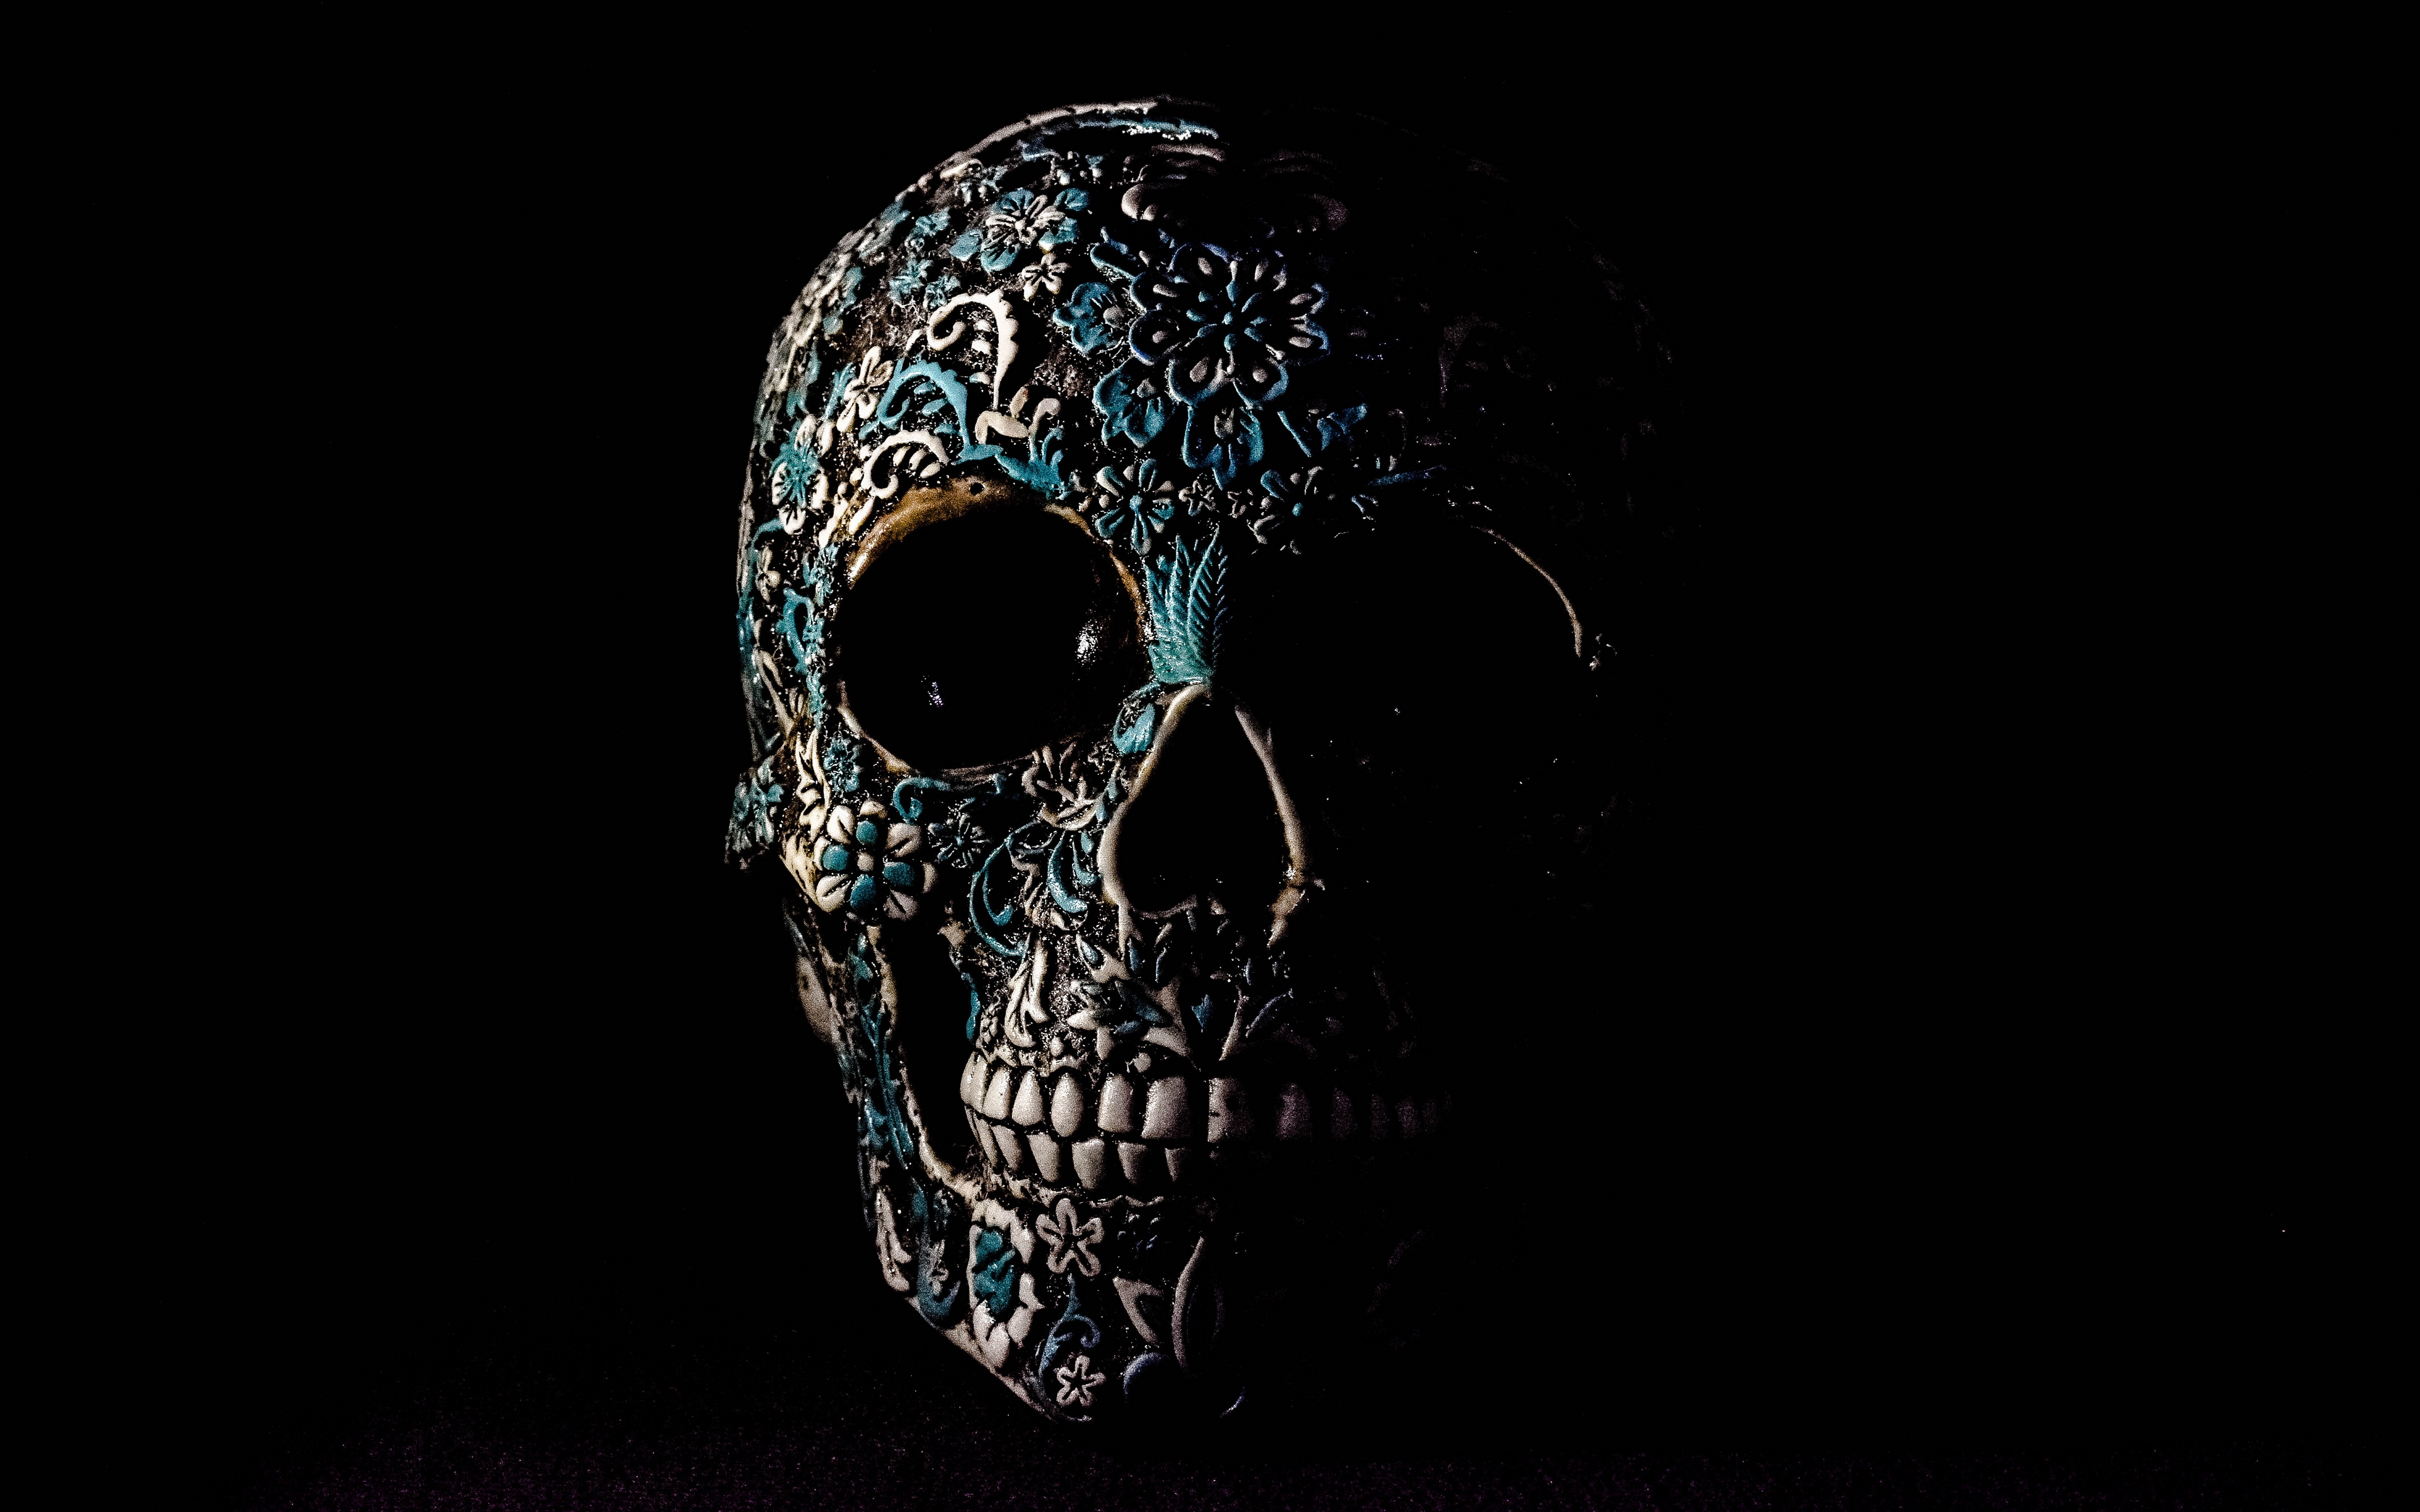 Skull Ultra Hd Wallpapers Wallpaper Cave